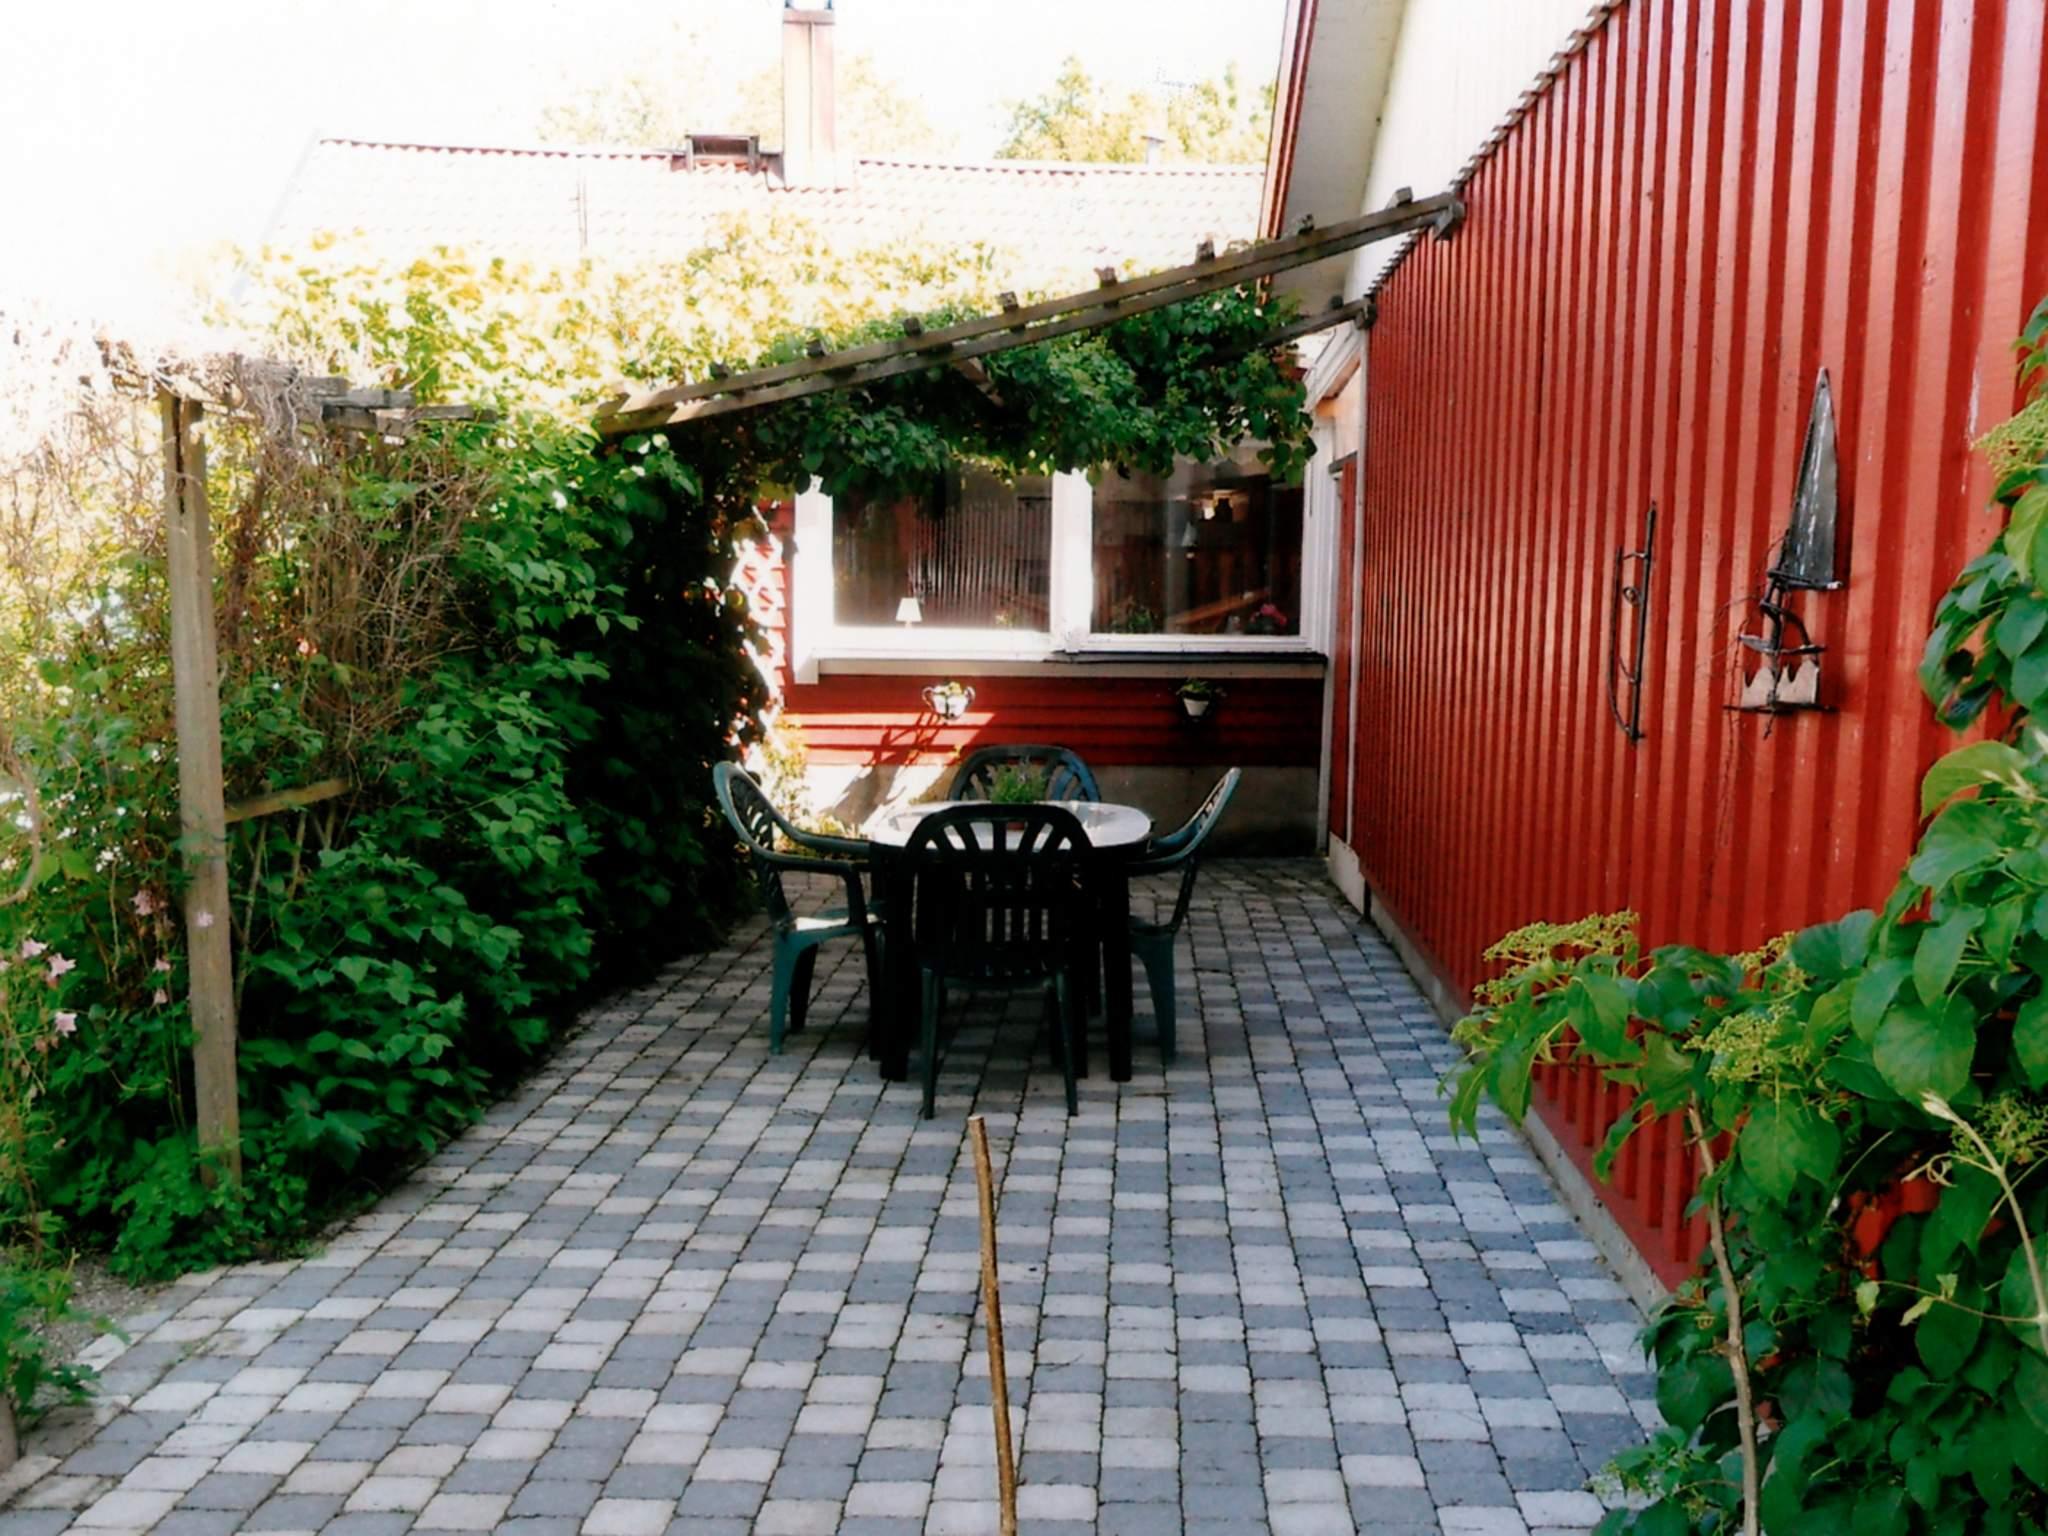 Ferienhaus Finjasjön (86936), Hässleholm, Skane län, Südschweden, Schweden, Bild 13